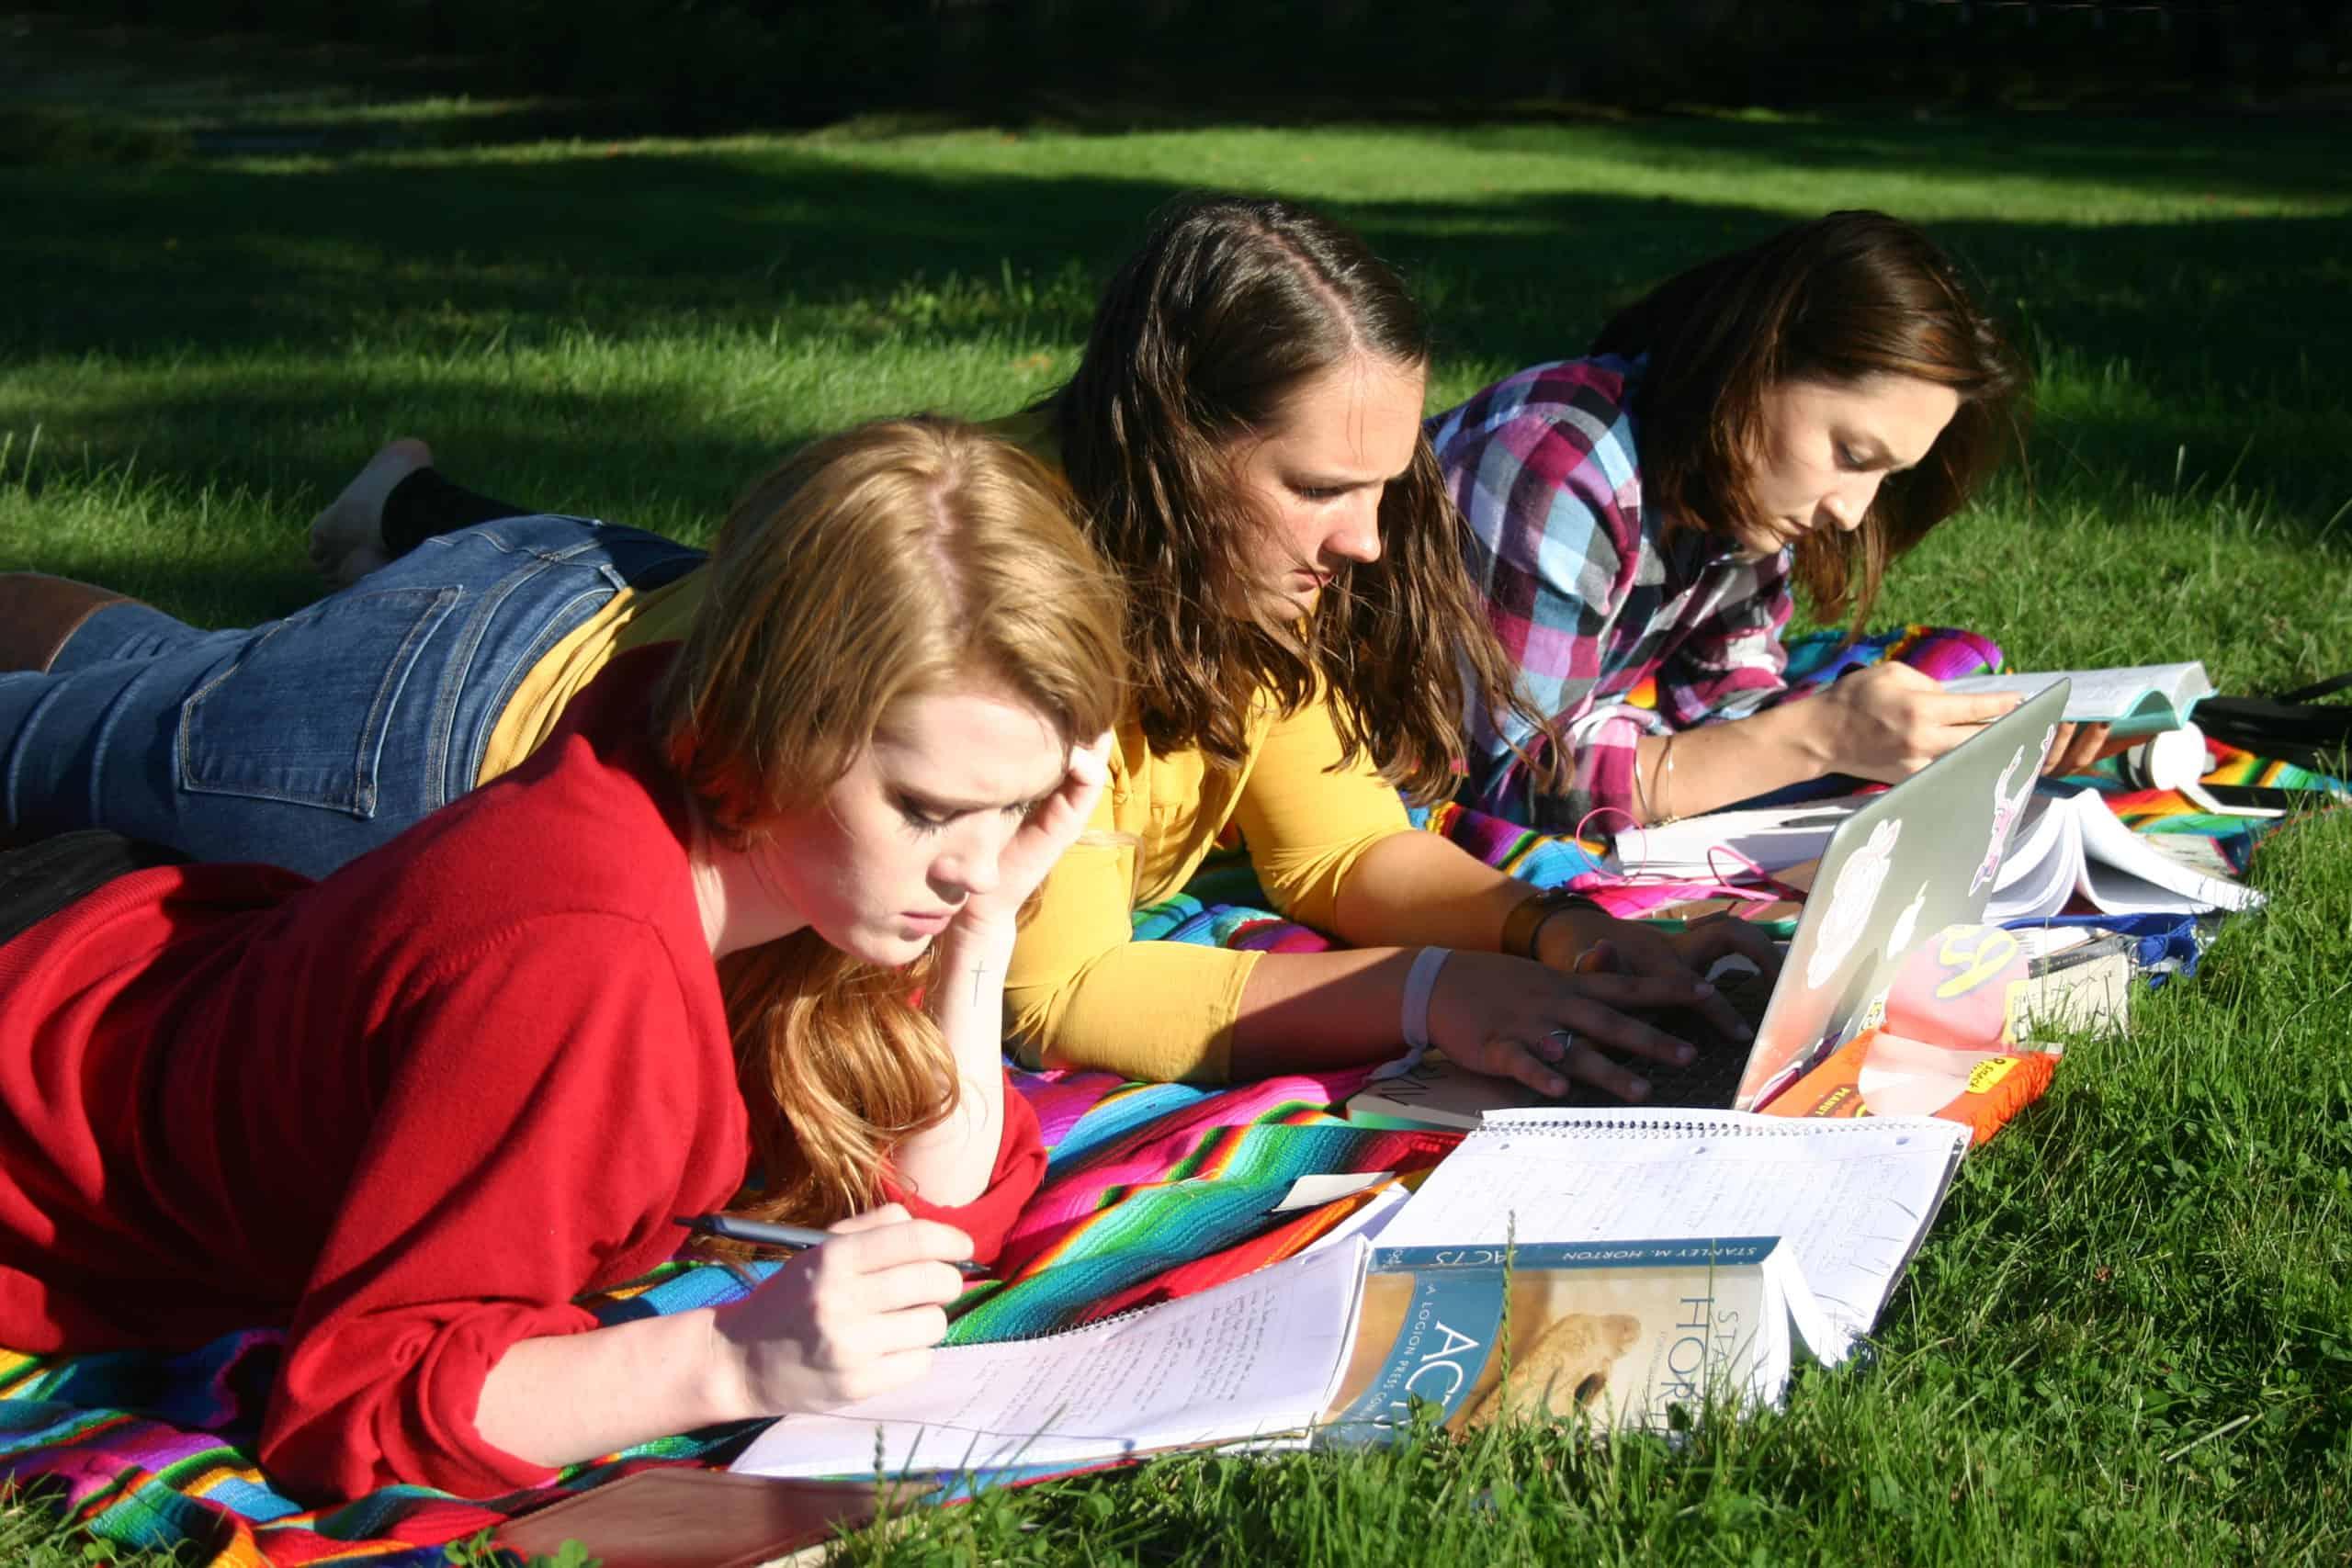 GIRLS-READING